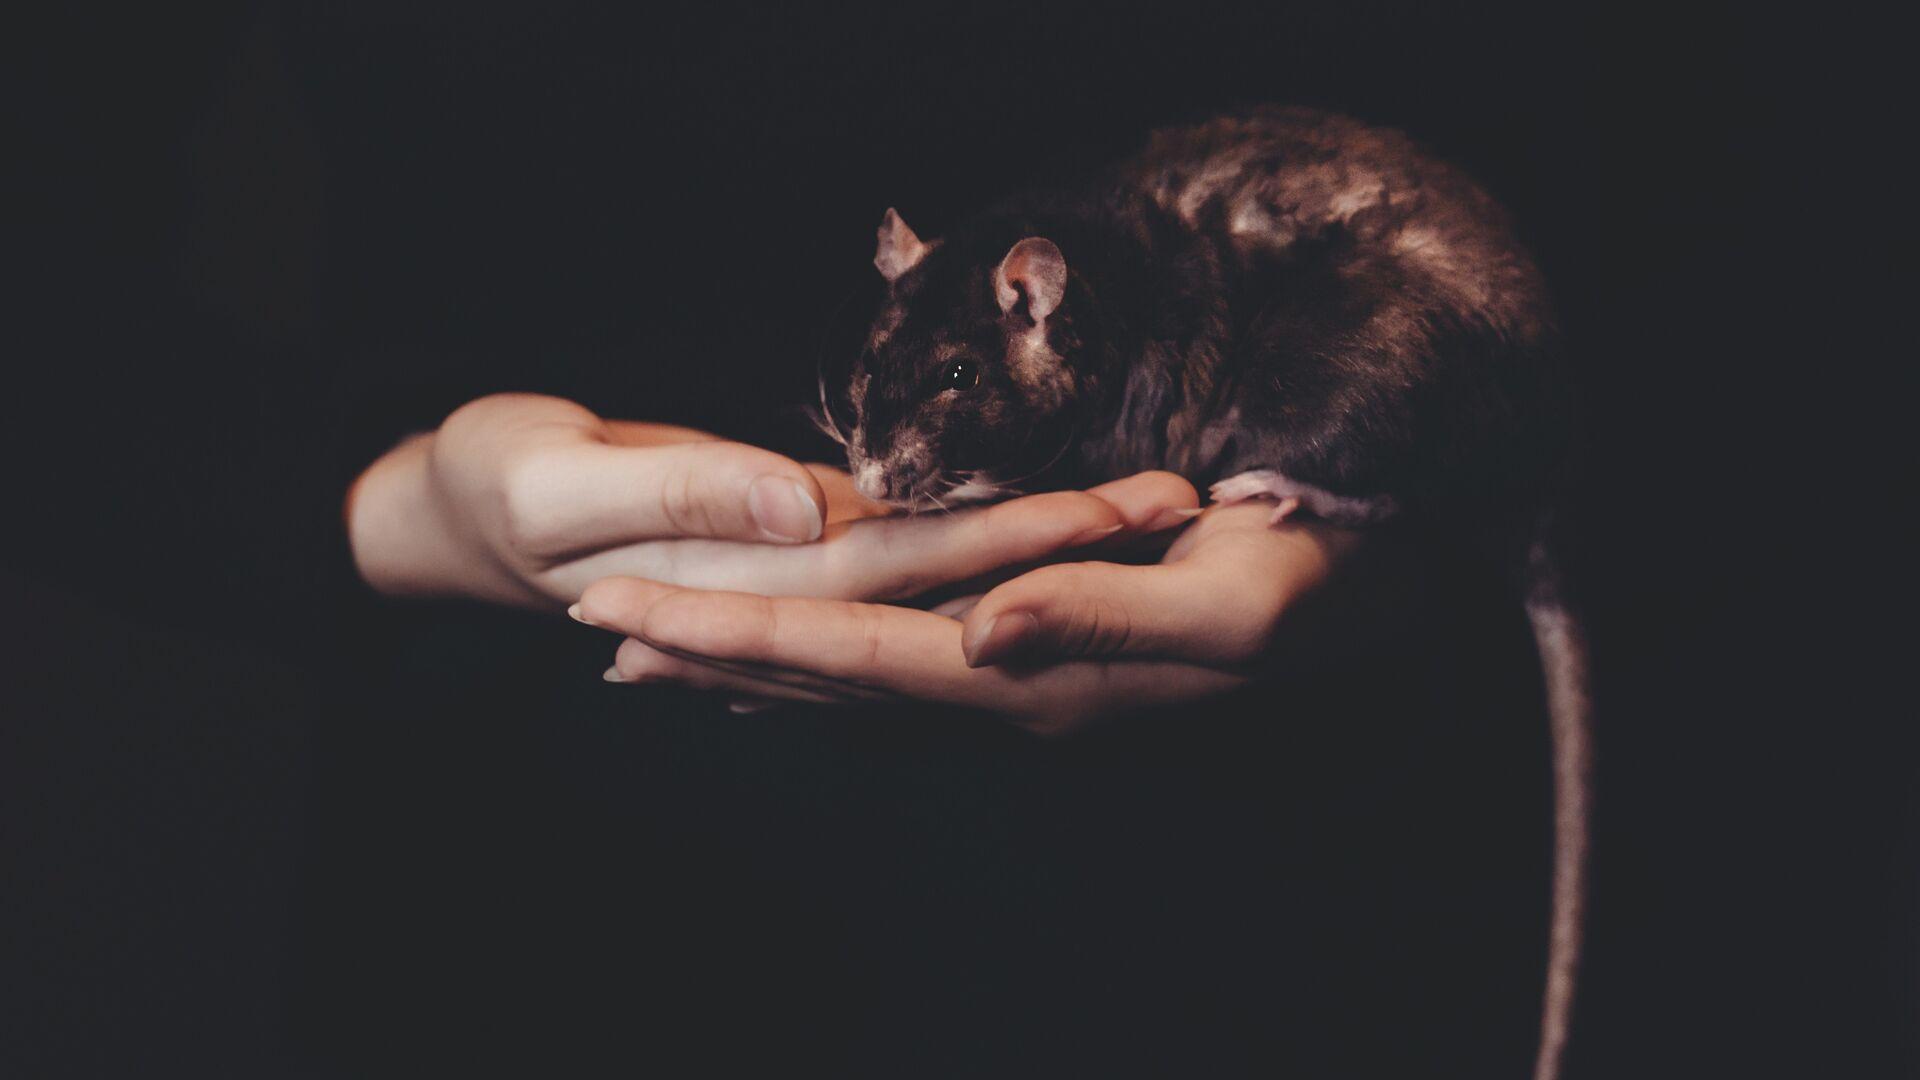 Una rata (imagen referencial) - Sputnik Mundo, 1920, 03.06.2021